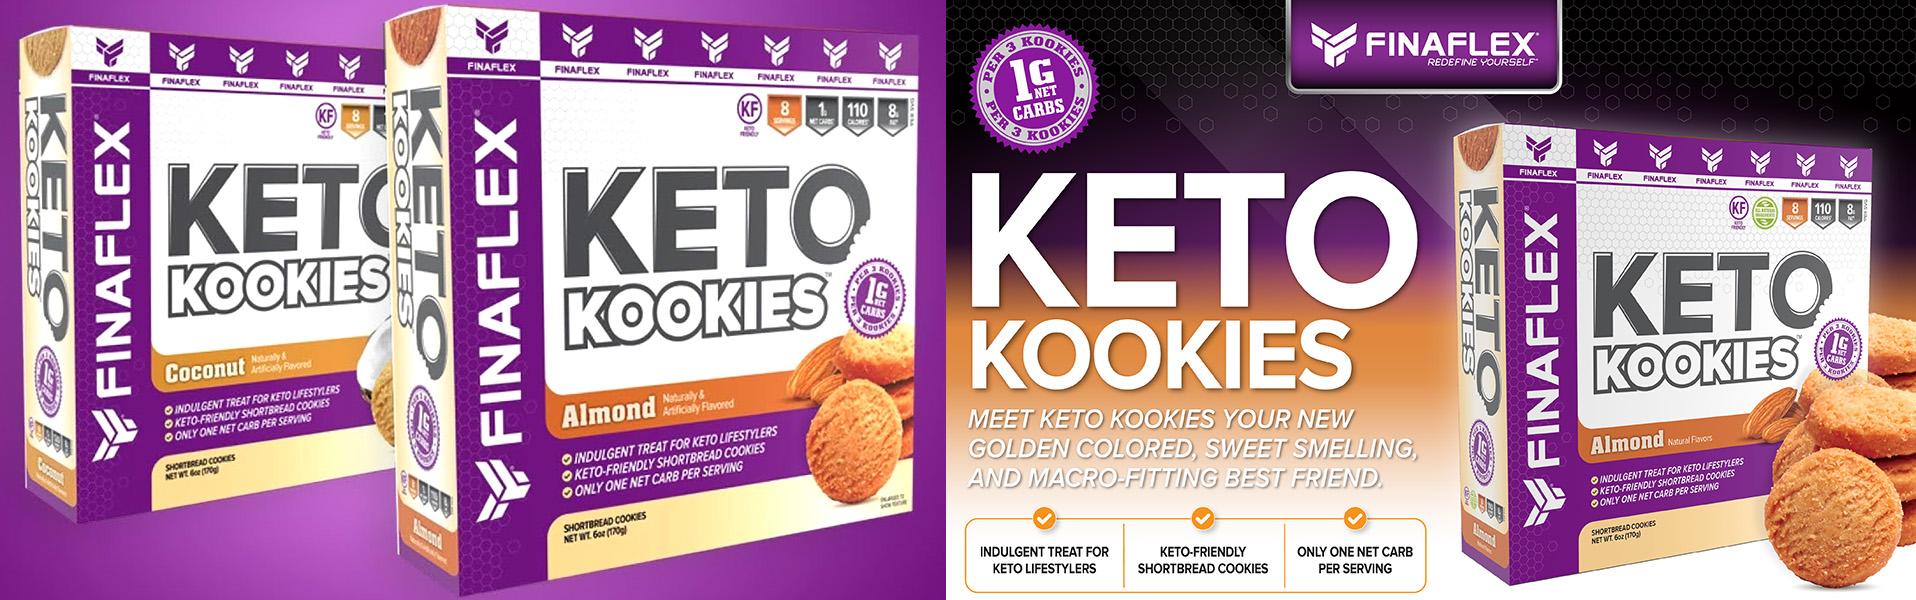 Finaflex Keto Kookies Cookies